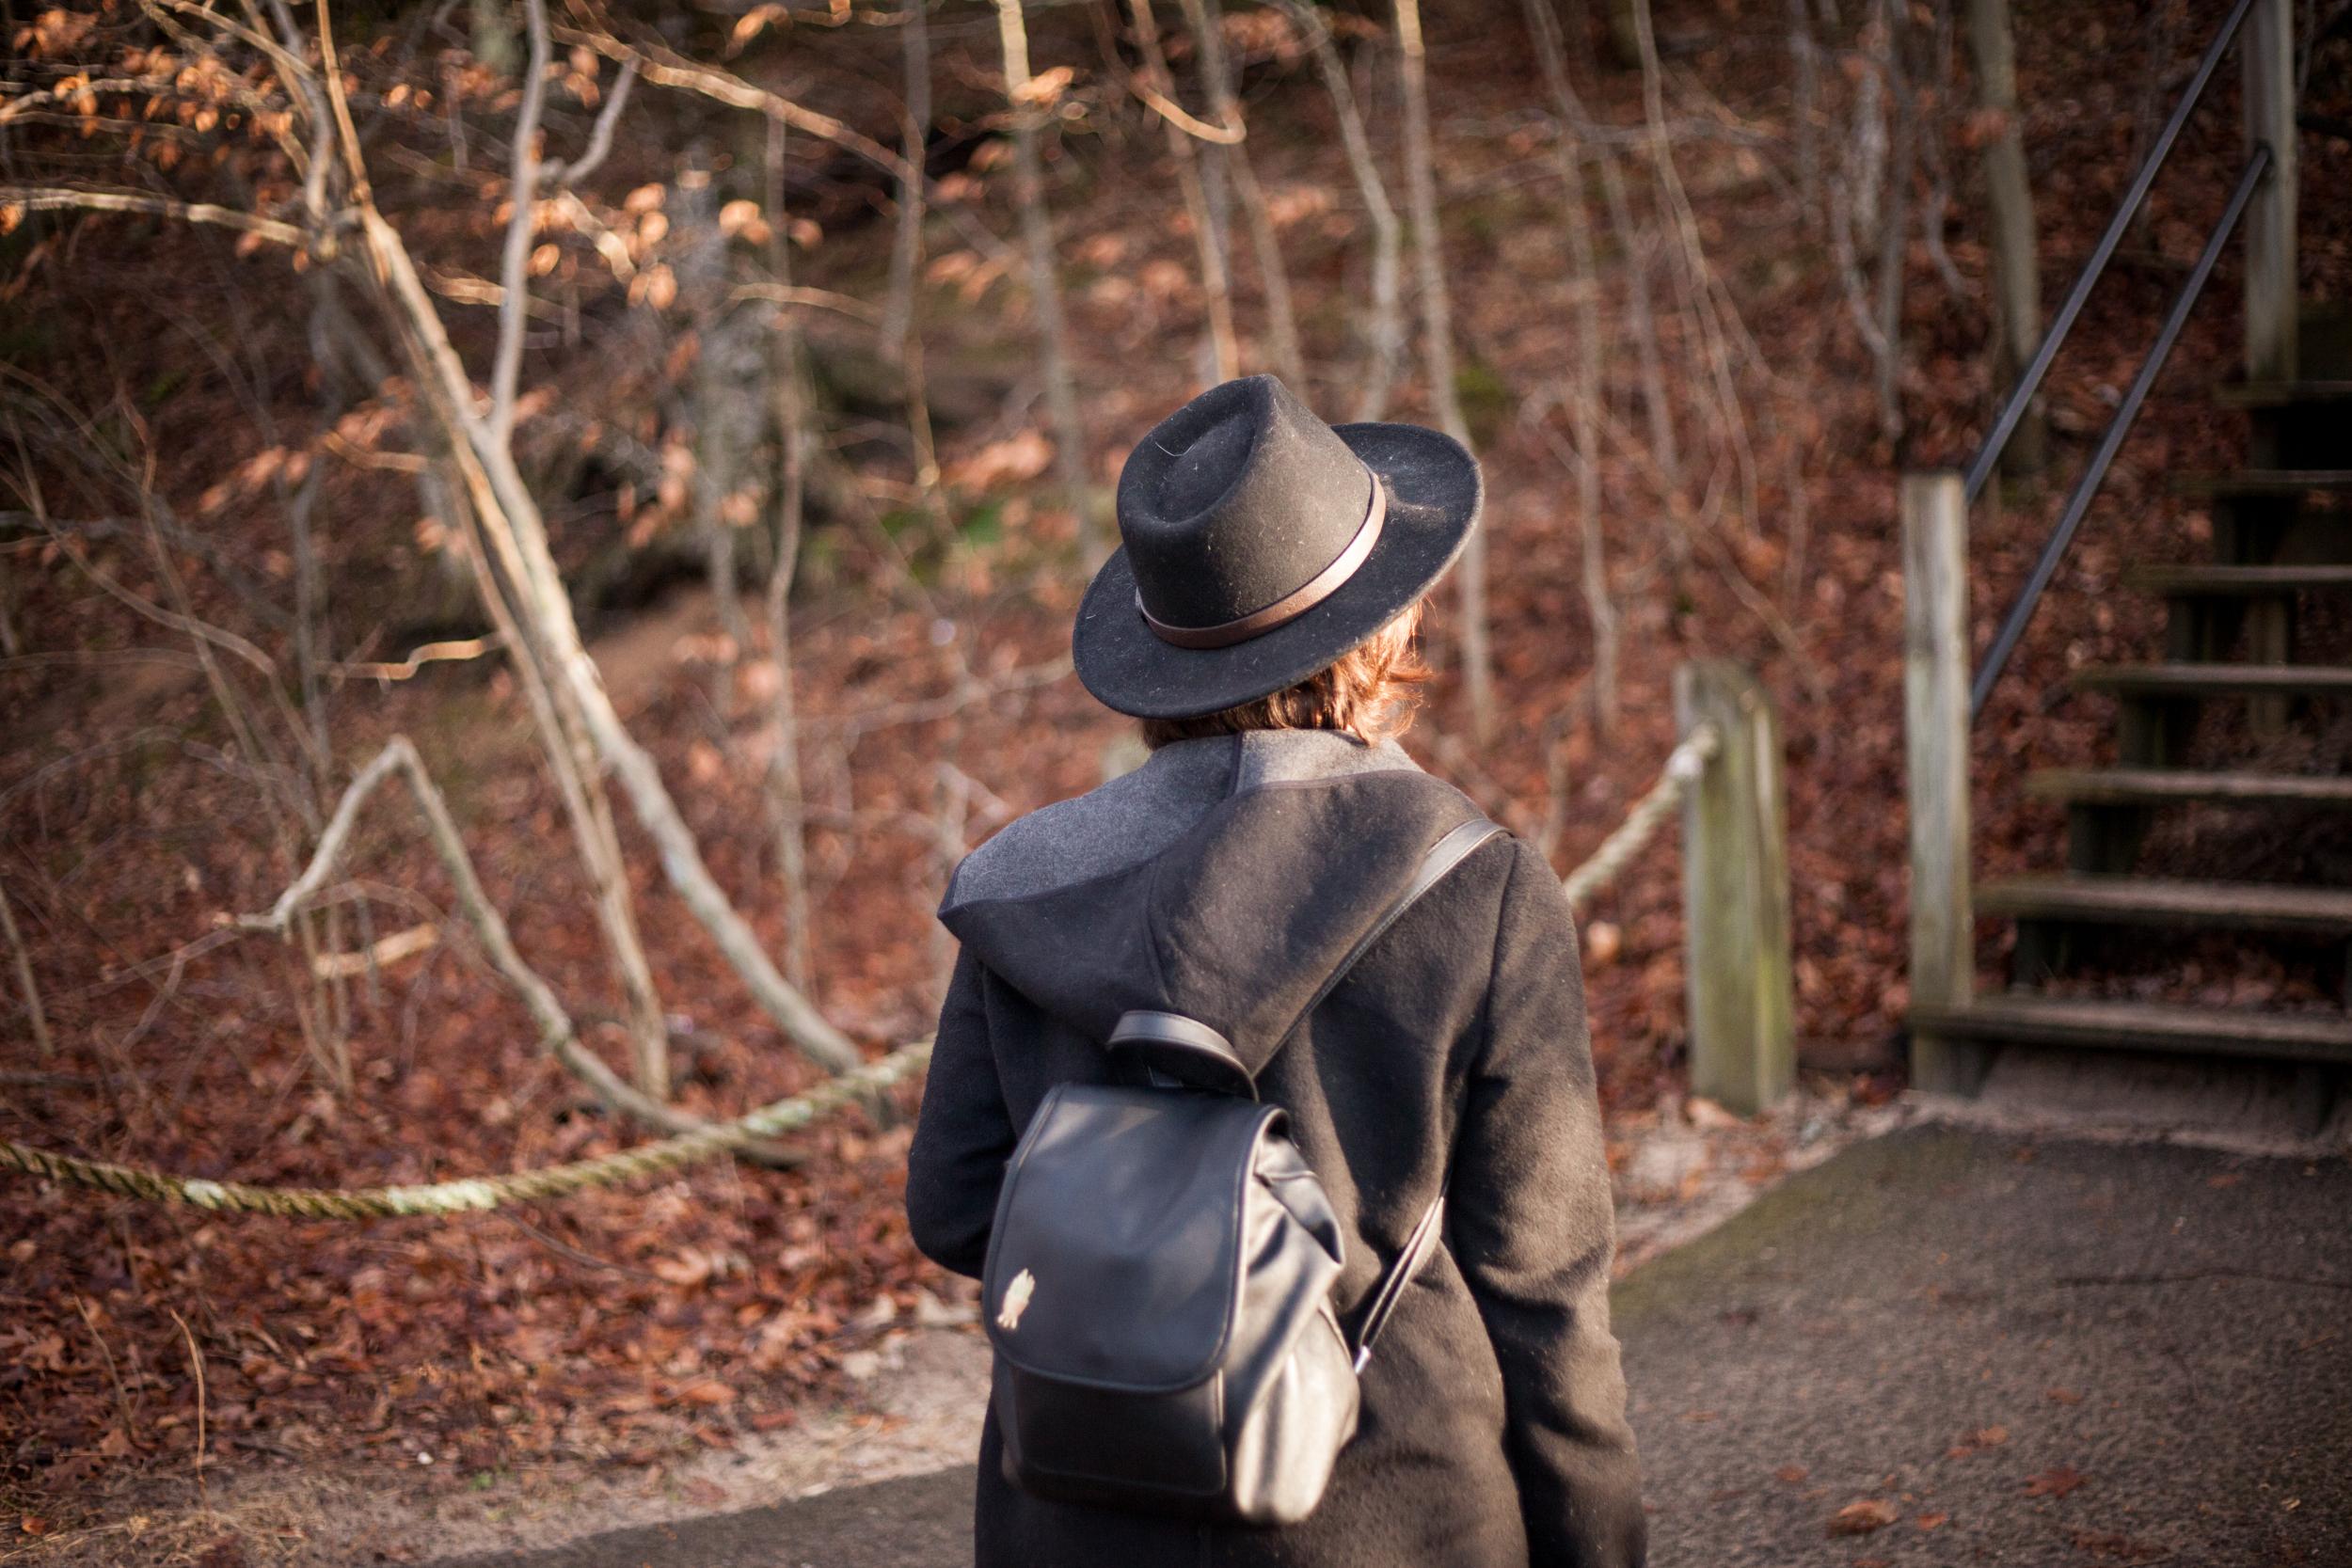 Awayaway_MeganLendmanPhotography-1.jpg